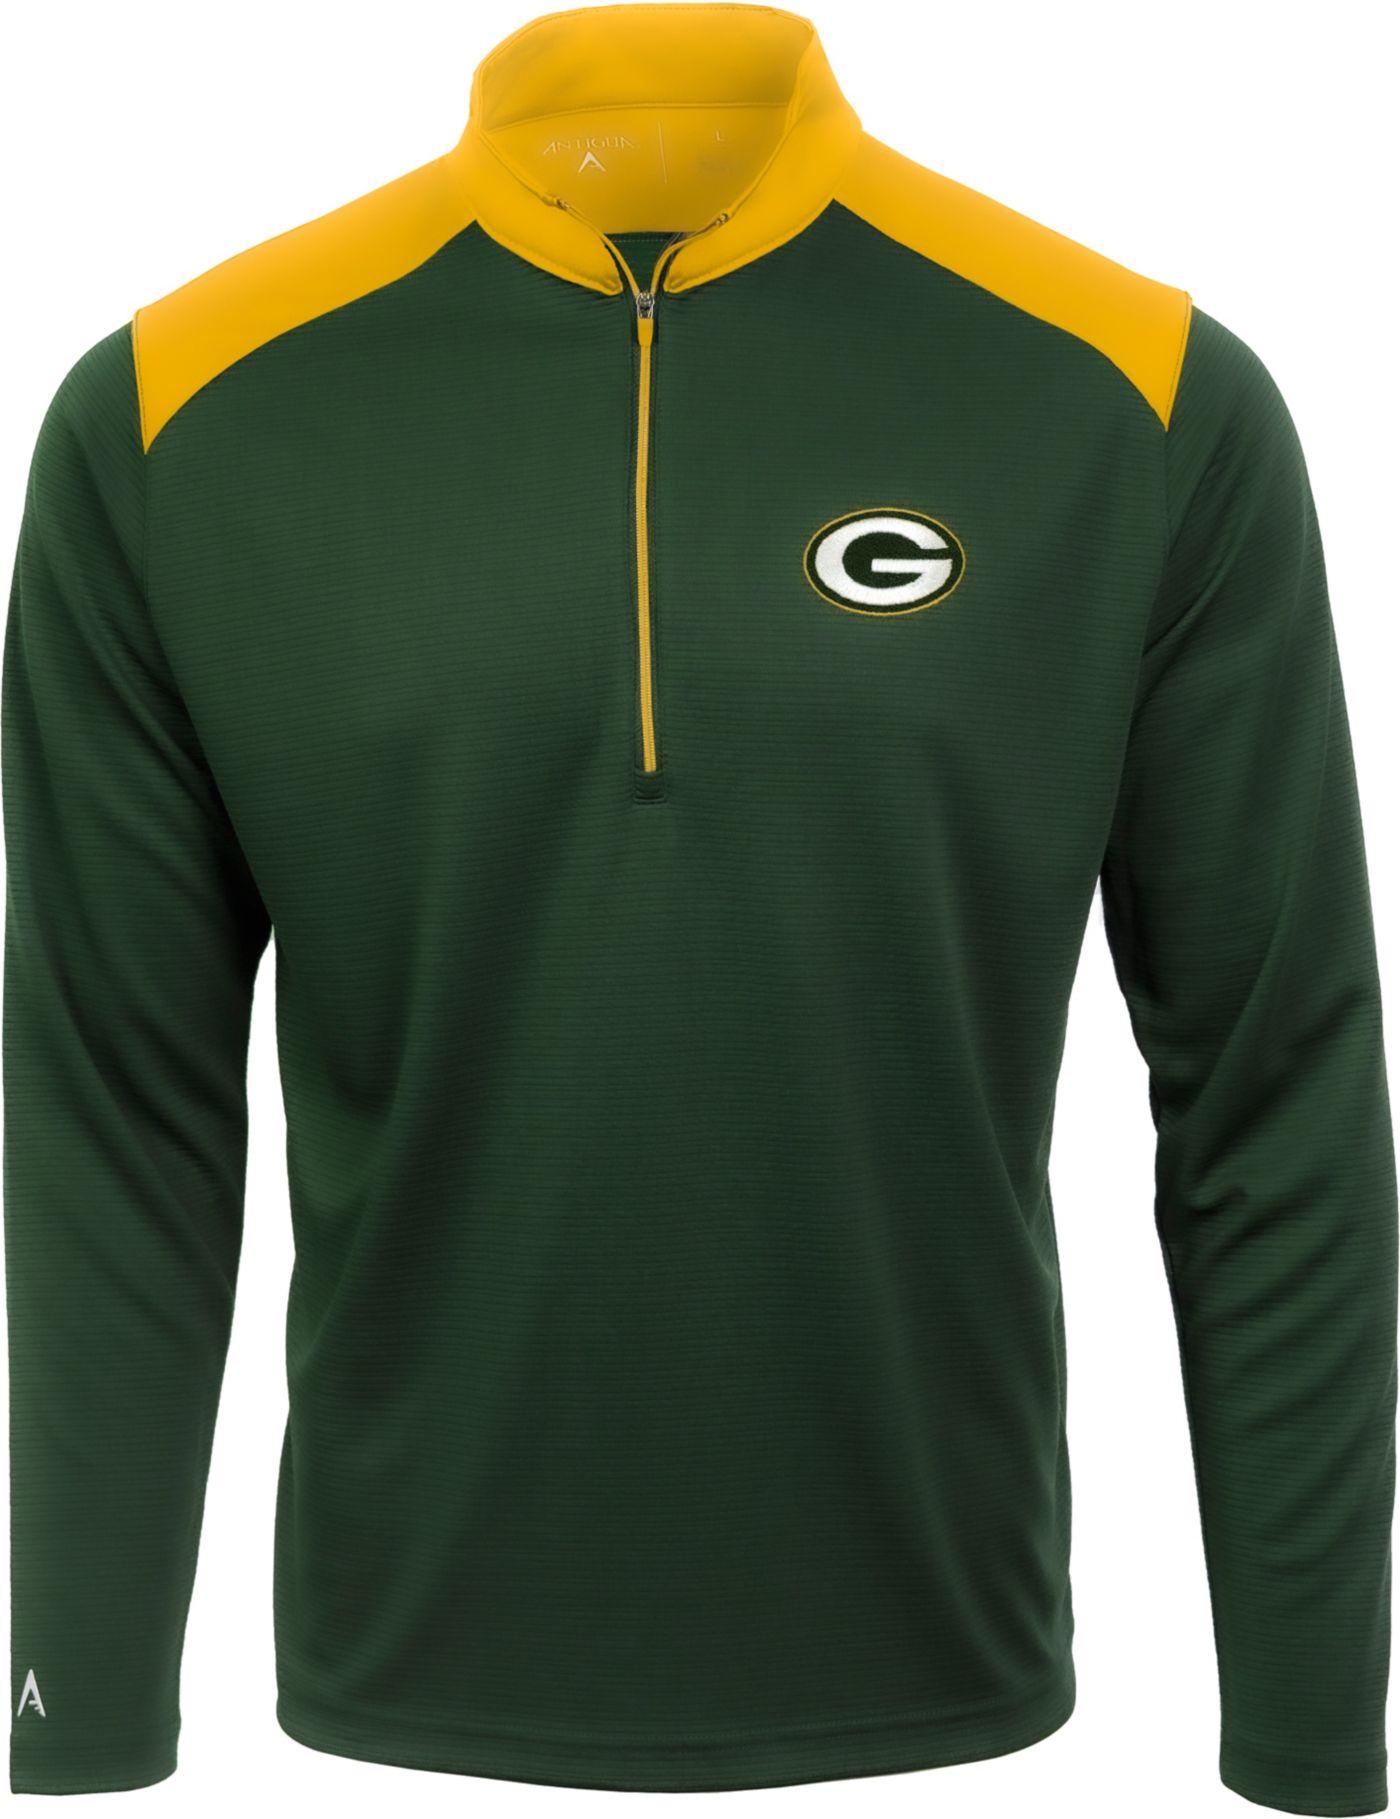 Antigua Men's Green Bay Packers Velocity Green Quarter-Zip Pullover